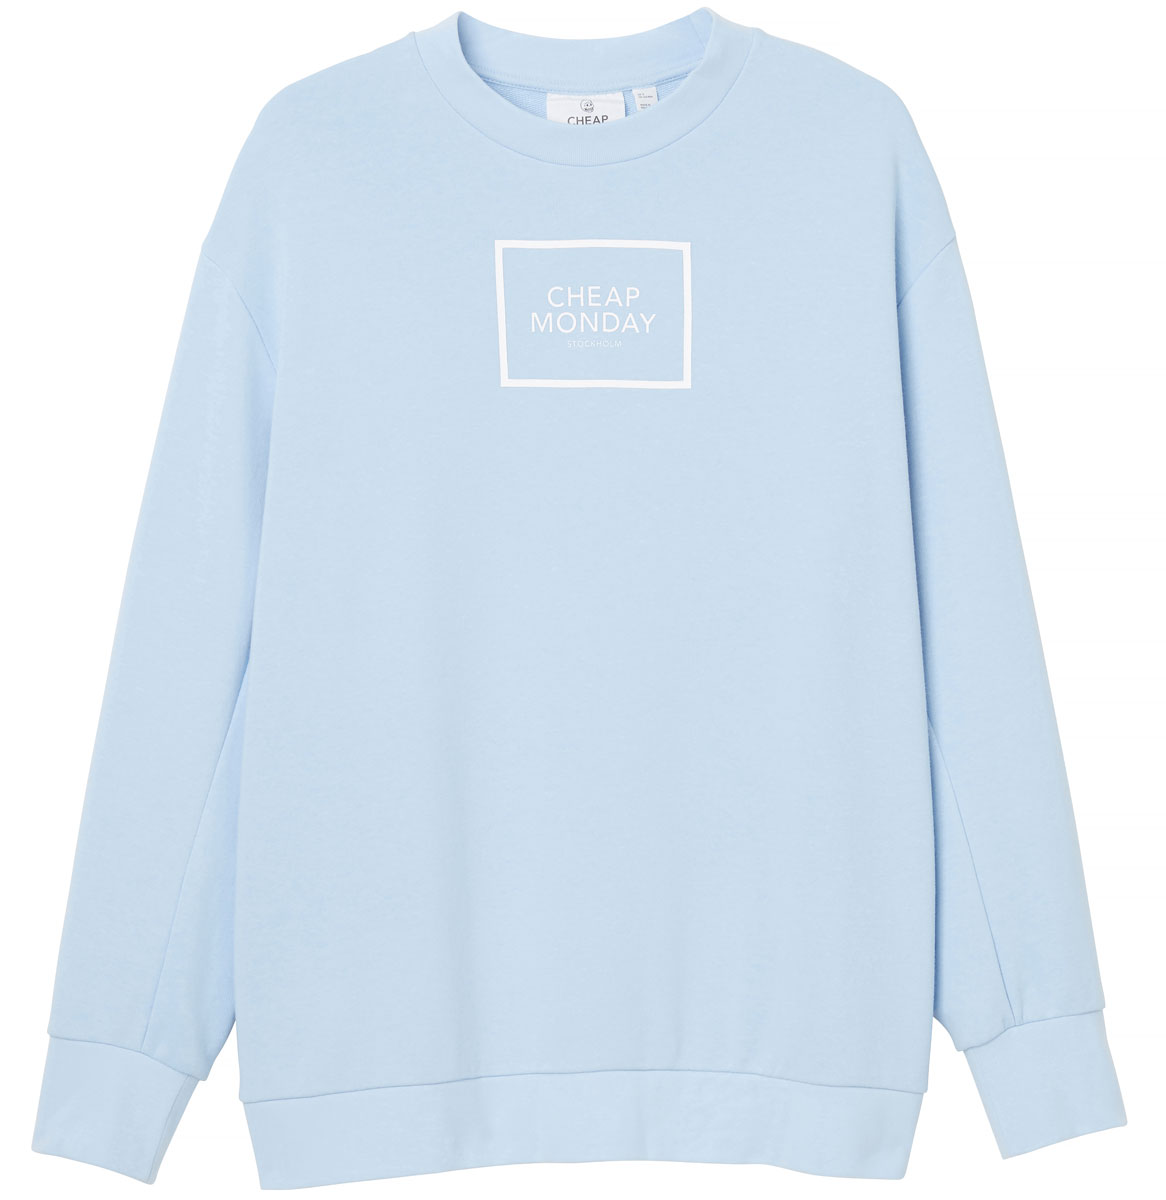 Свитшот женский Cheap Monday, цвет: голубой. 0556772. Размер XS (40) цена 2017